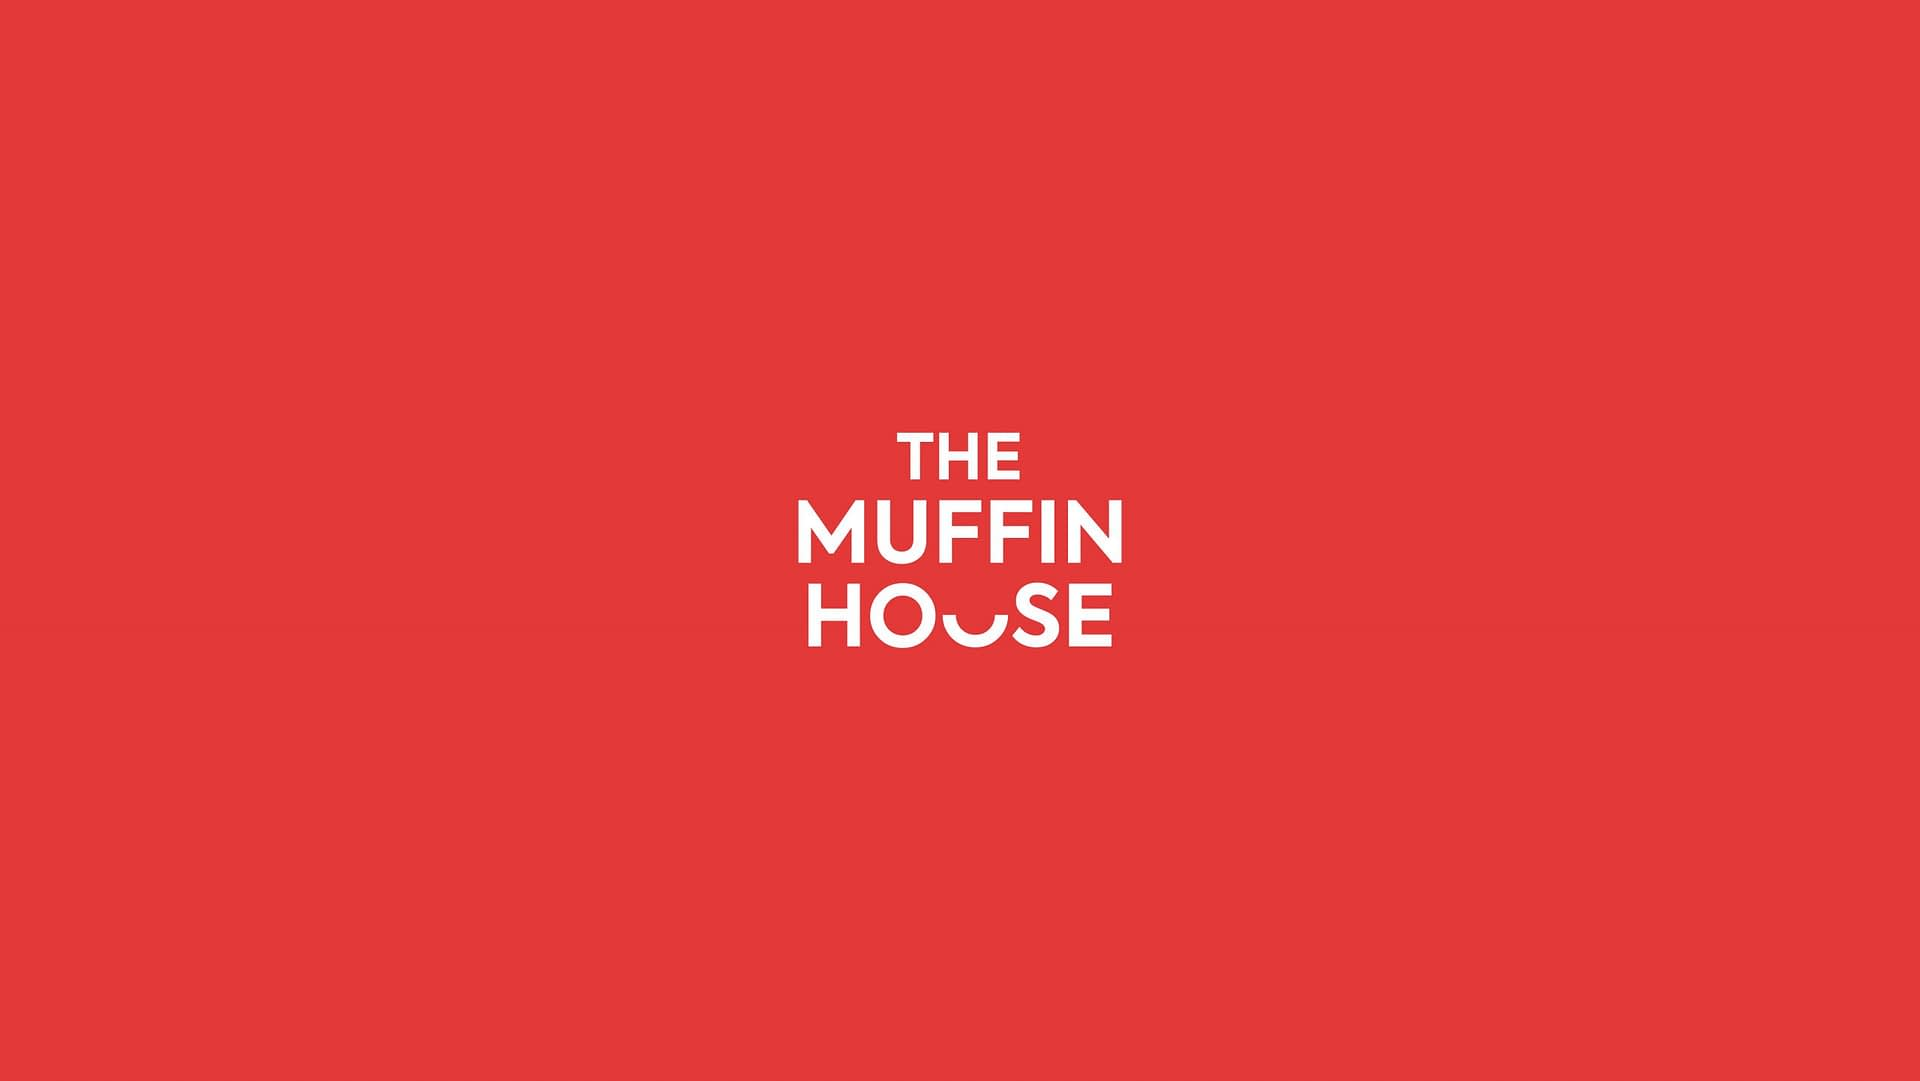 THE MUFFIN HOUSE LOGO DESIGN